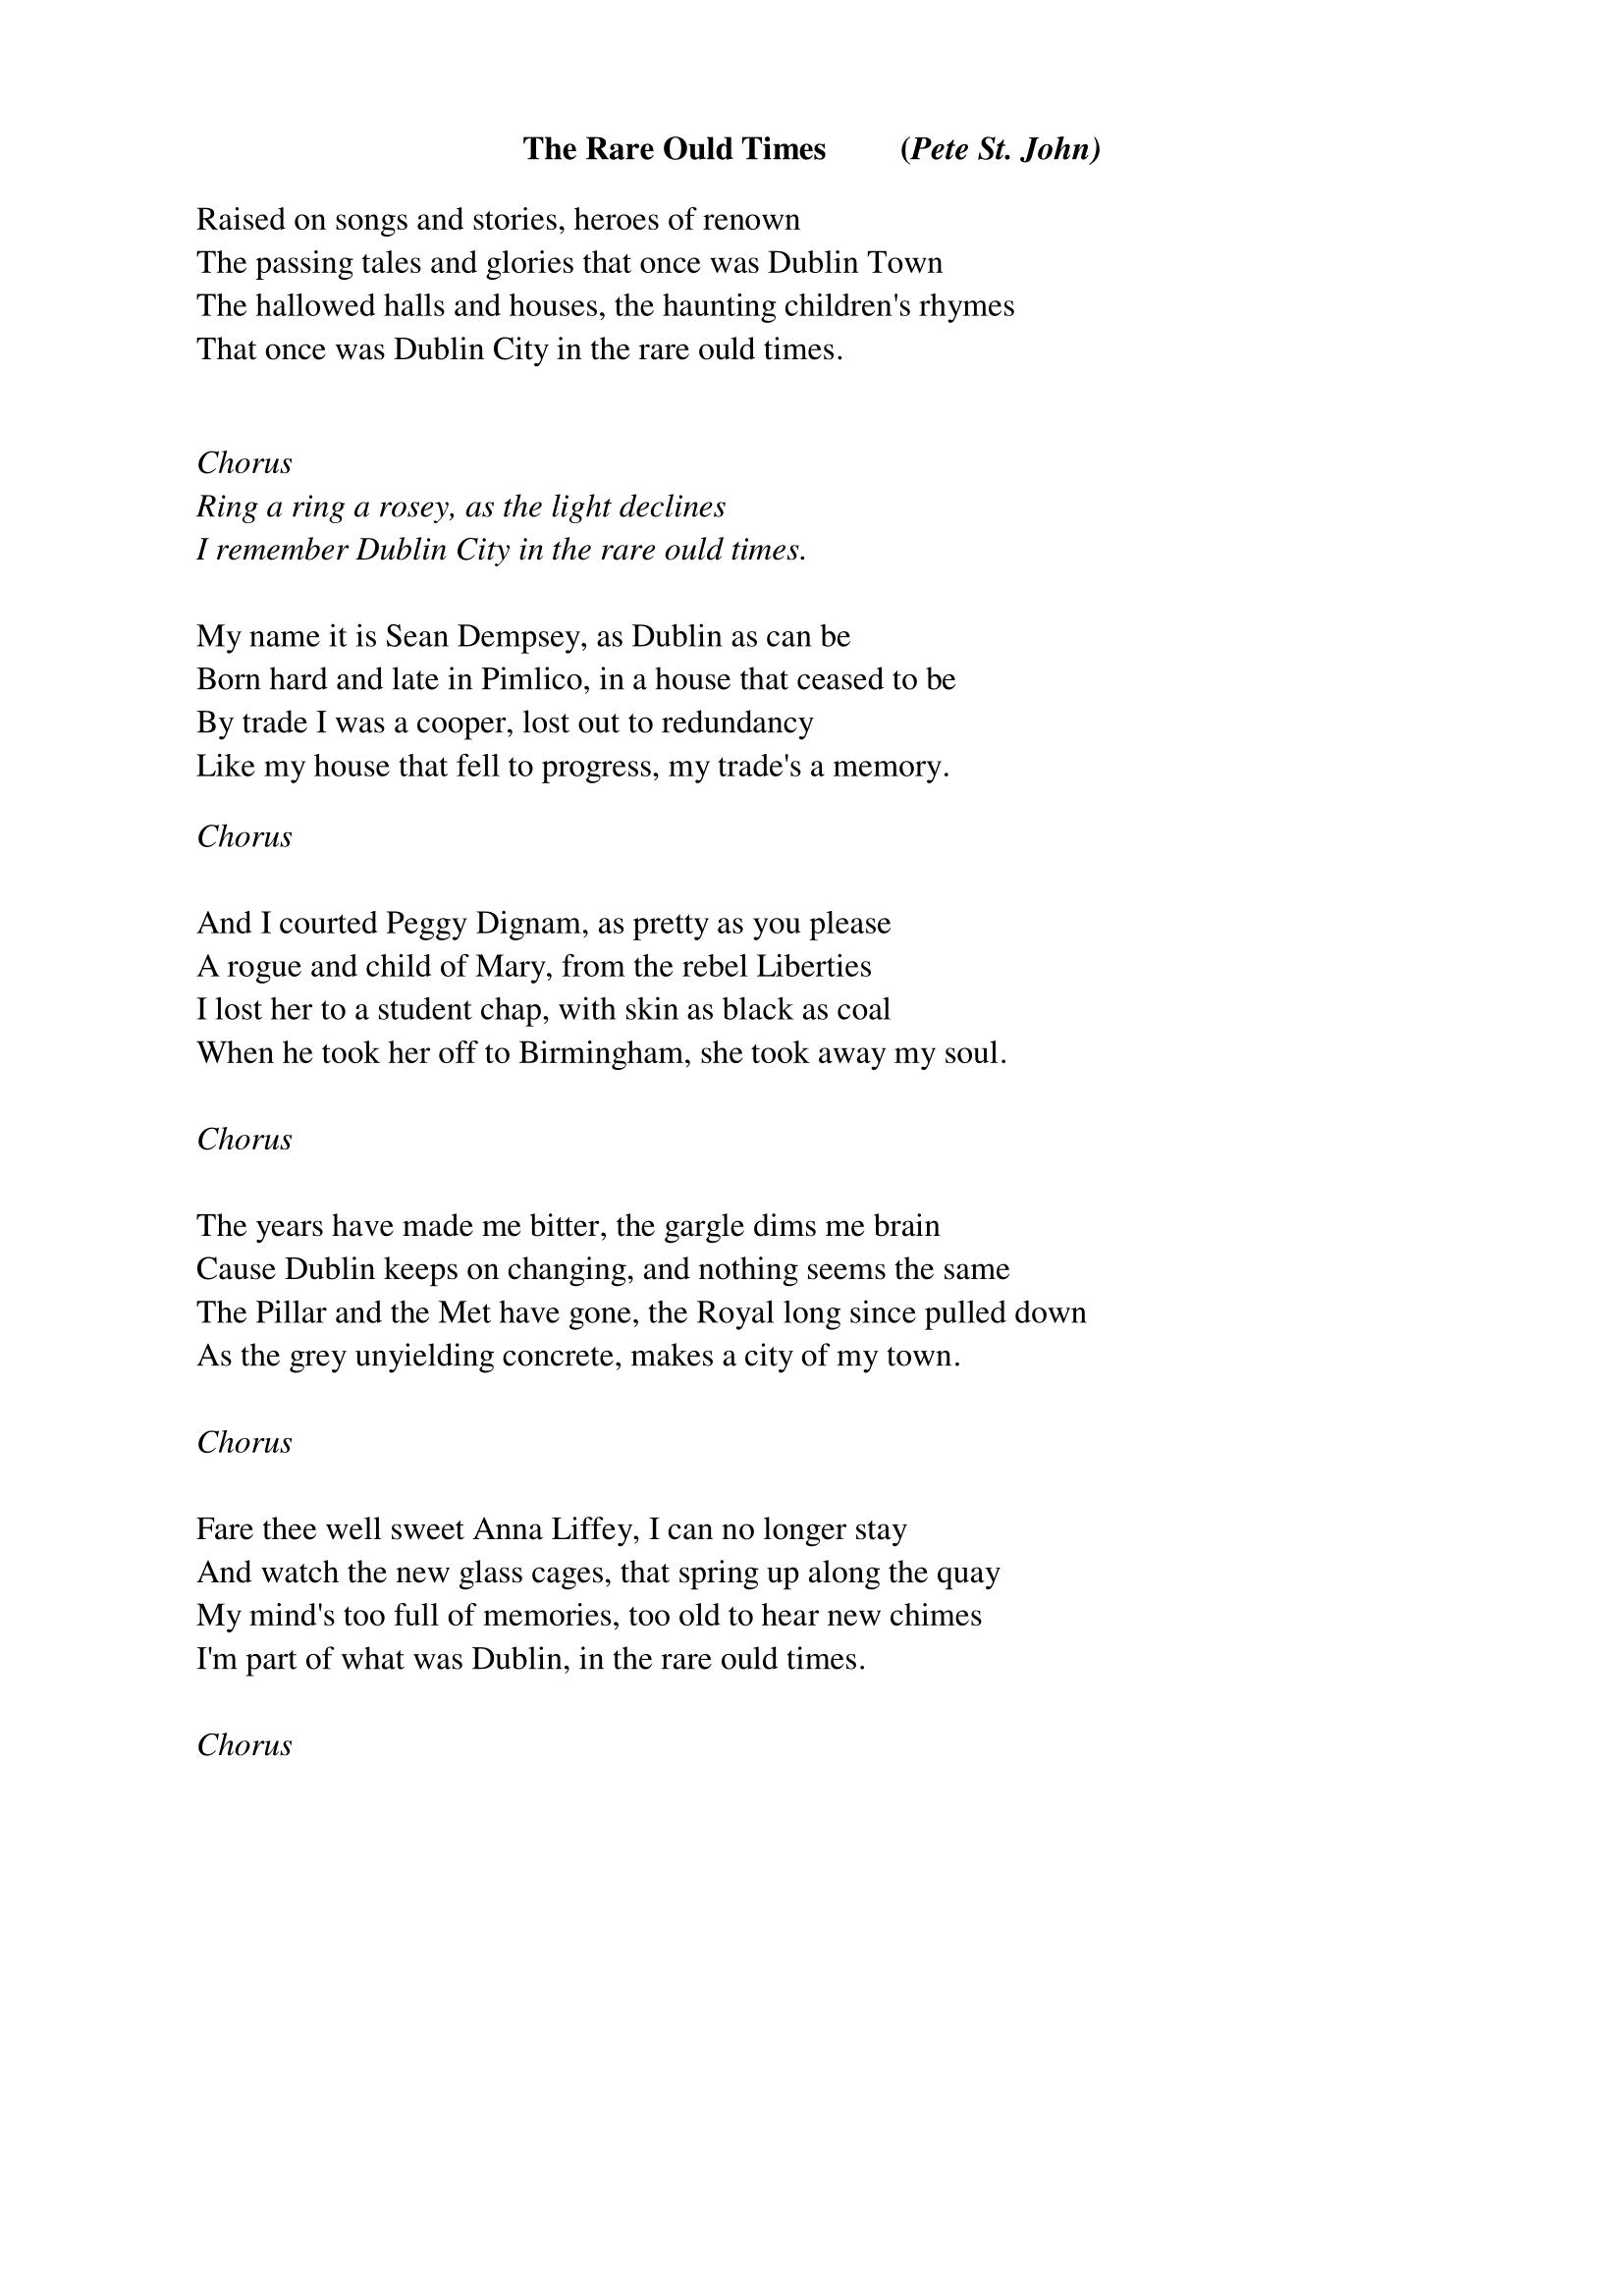 dublin-in-the-rare-ould-times-lyrics-1